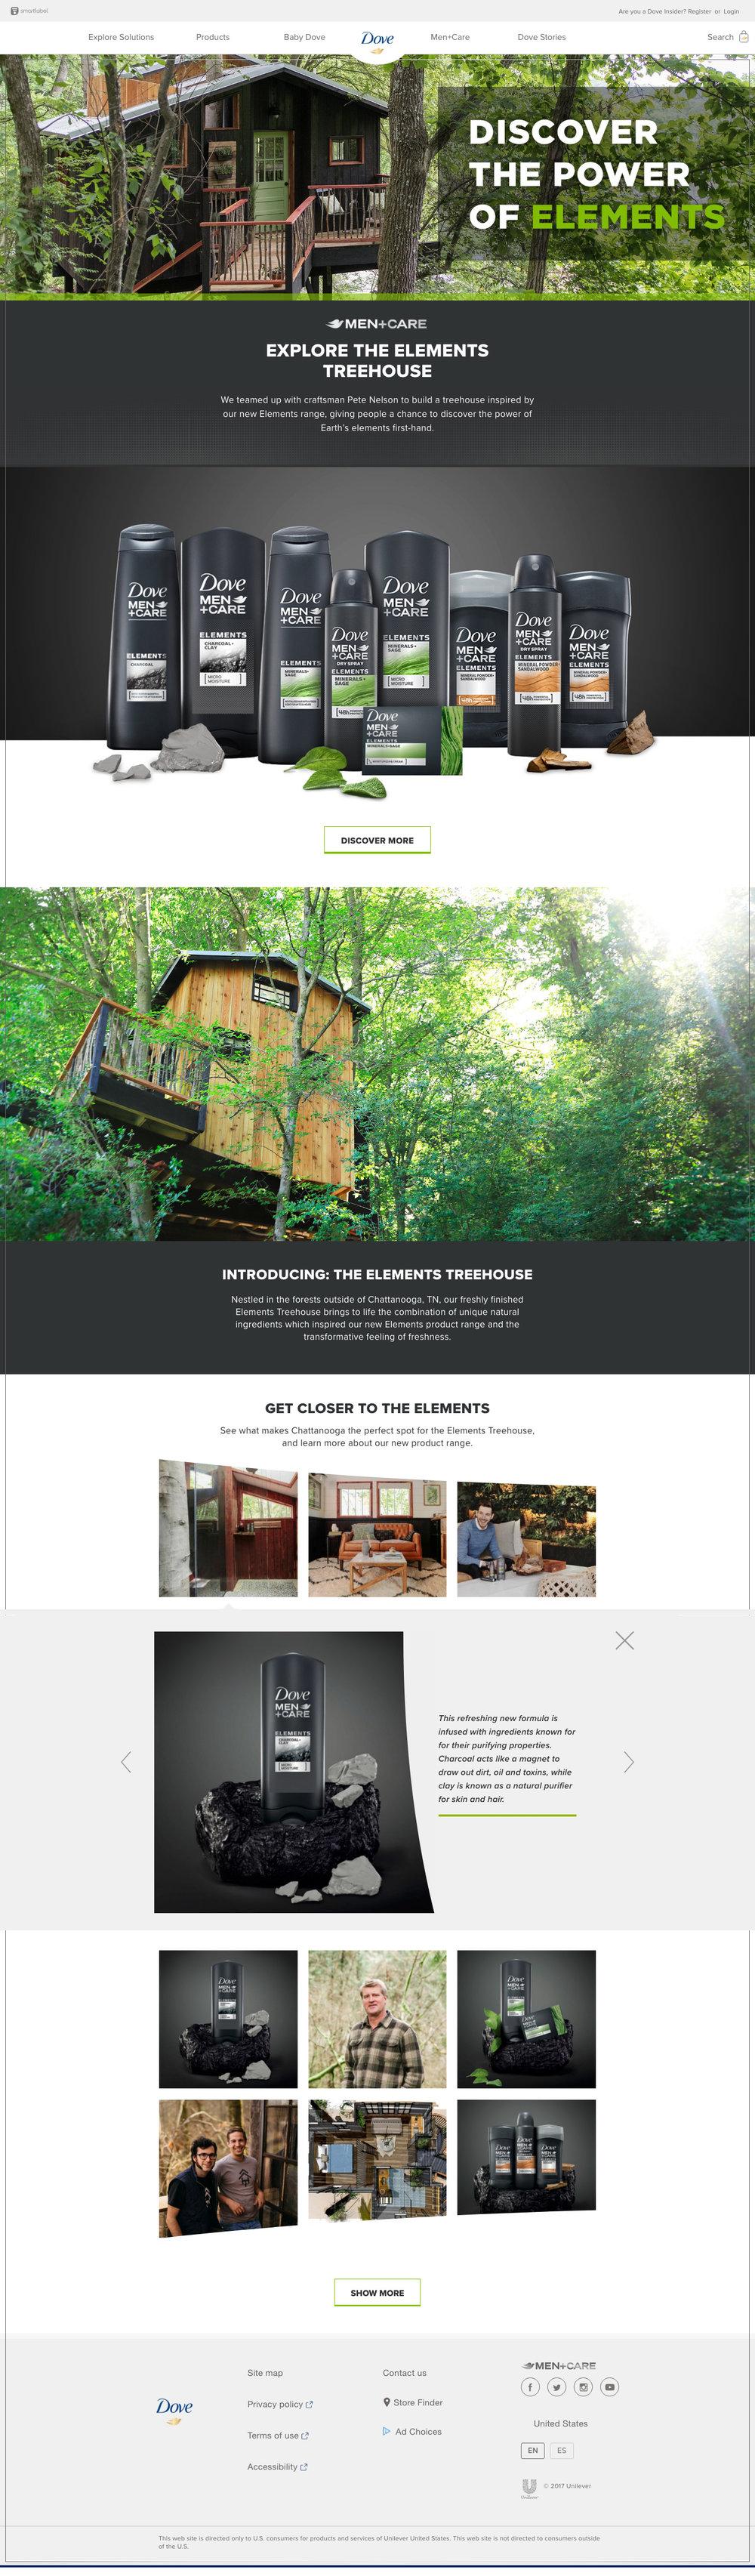 treehouse-psdh.jpg